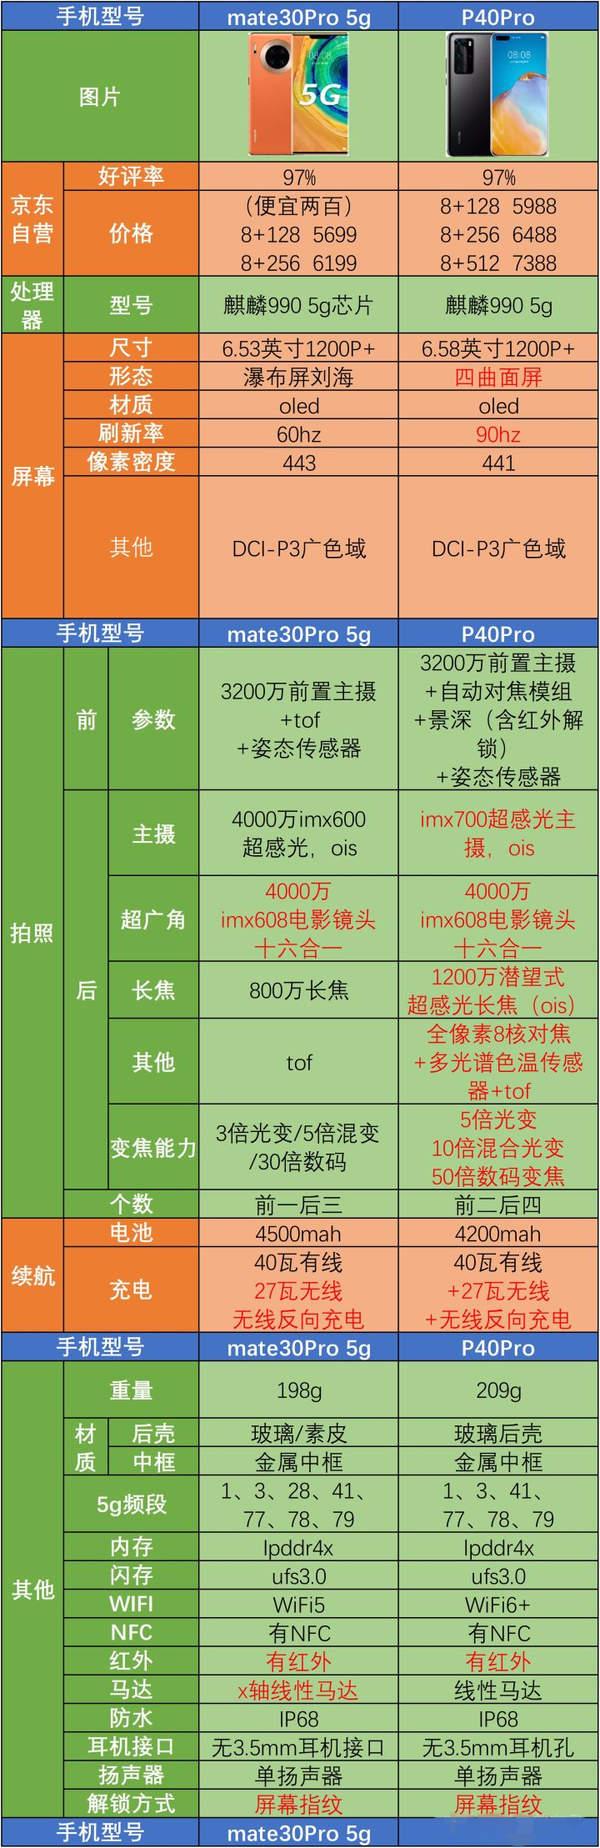 p40pro和mate30pro对比哪个好?参数配置详情介绍